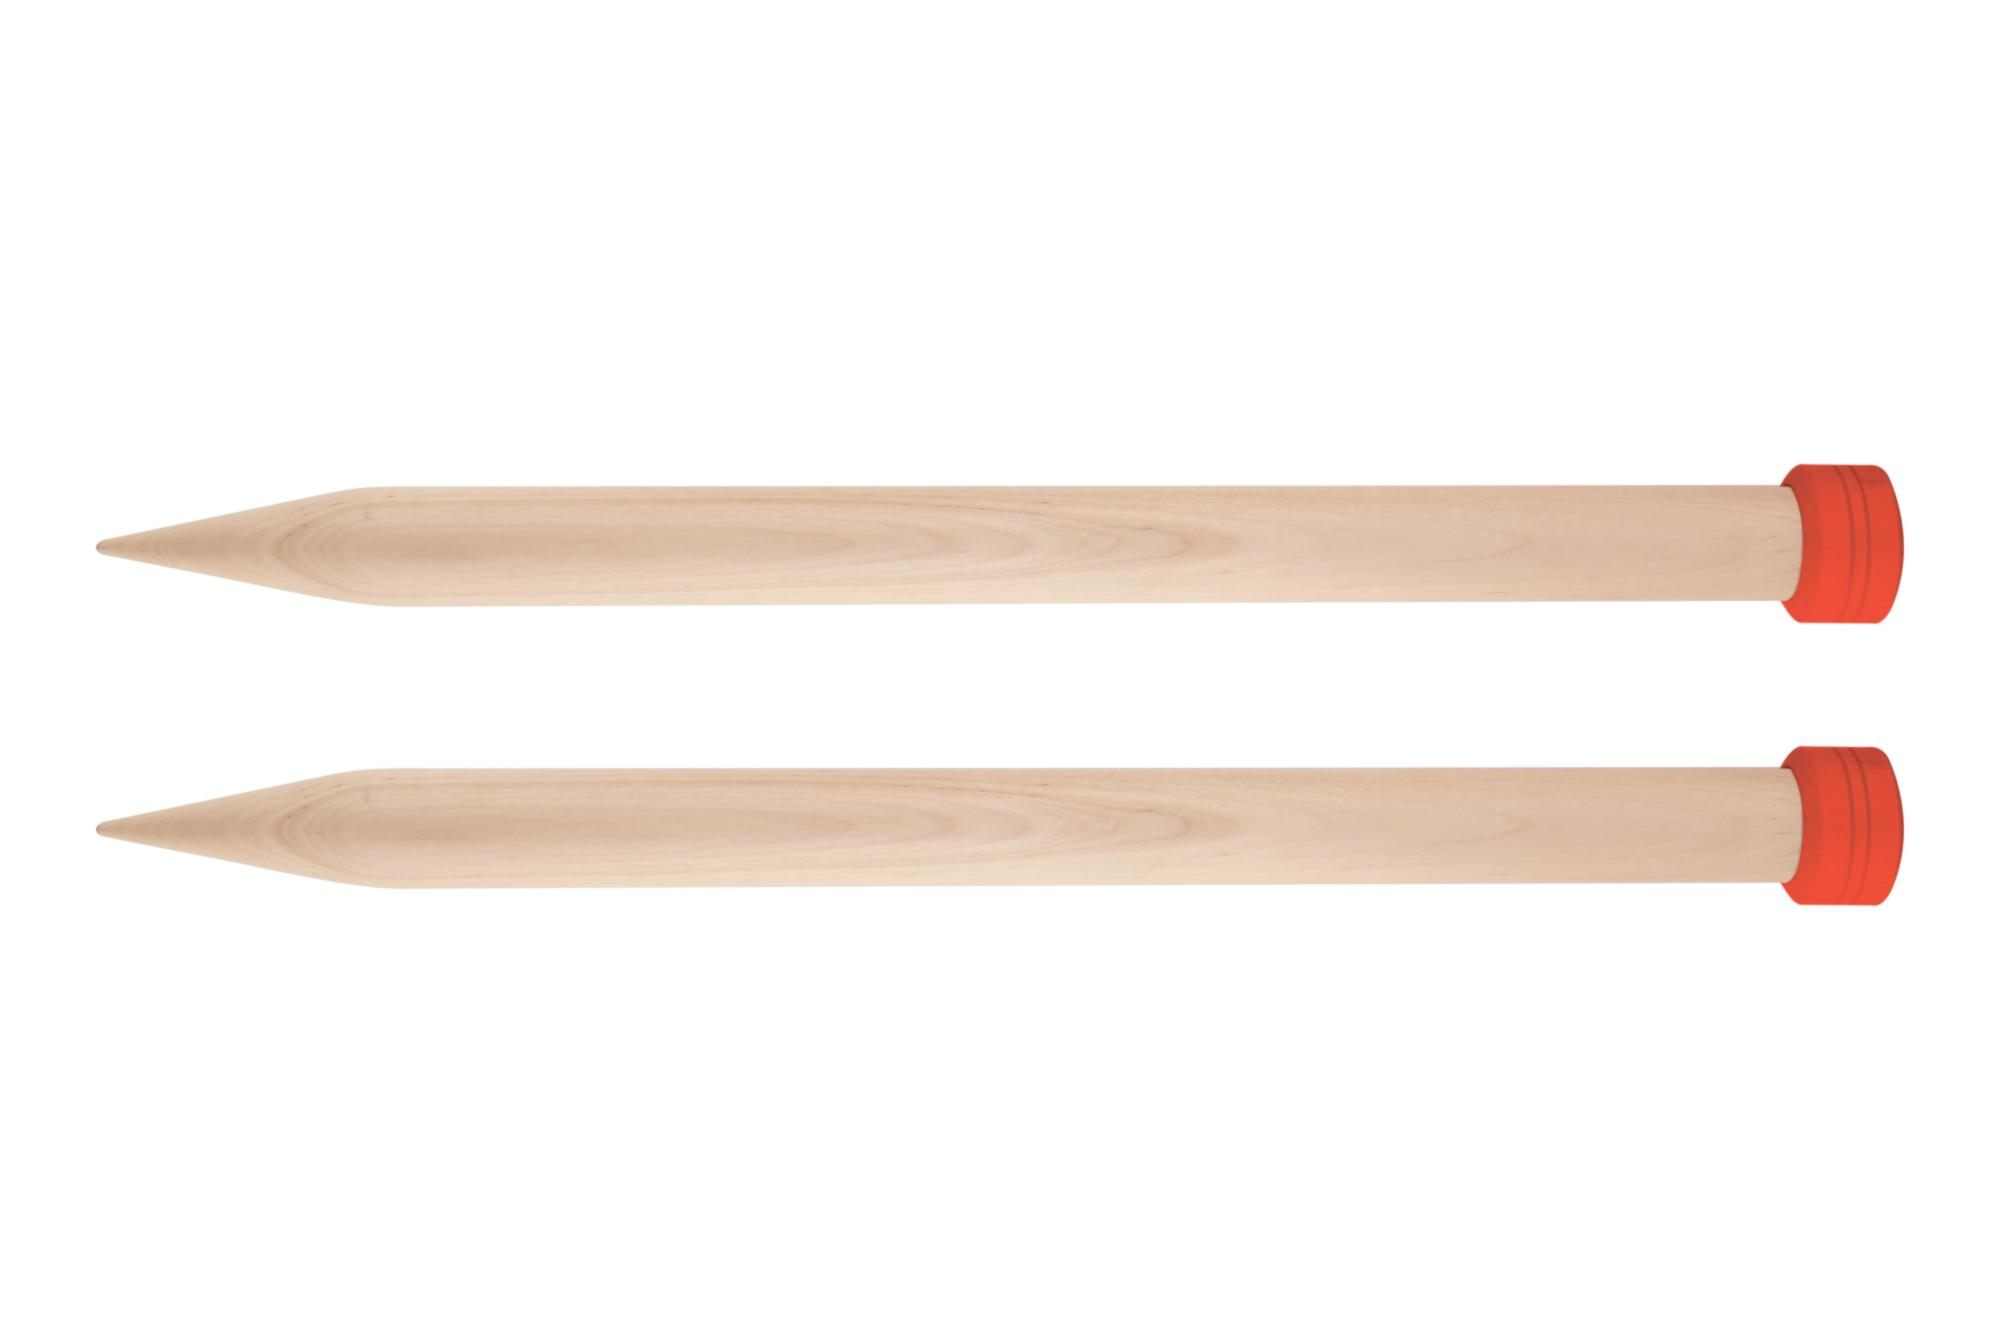 Спицы прямые 35 см Jumbo Birch KnitPro, 35270, 20.00 мм